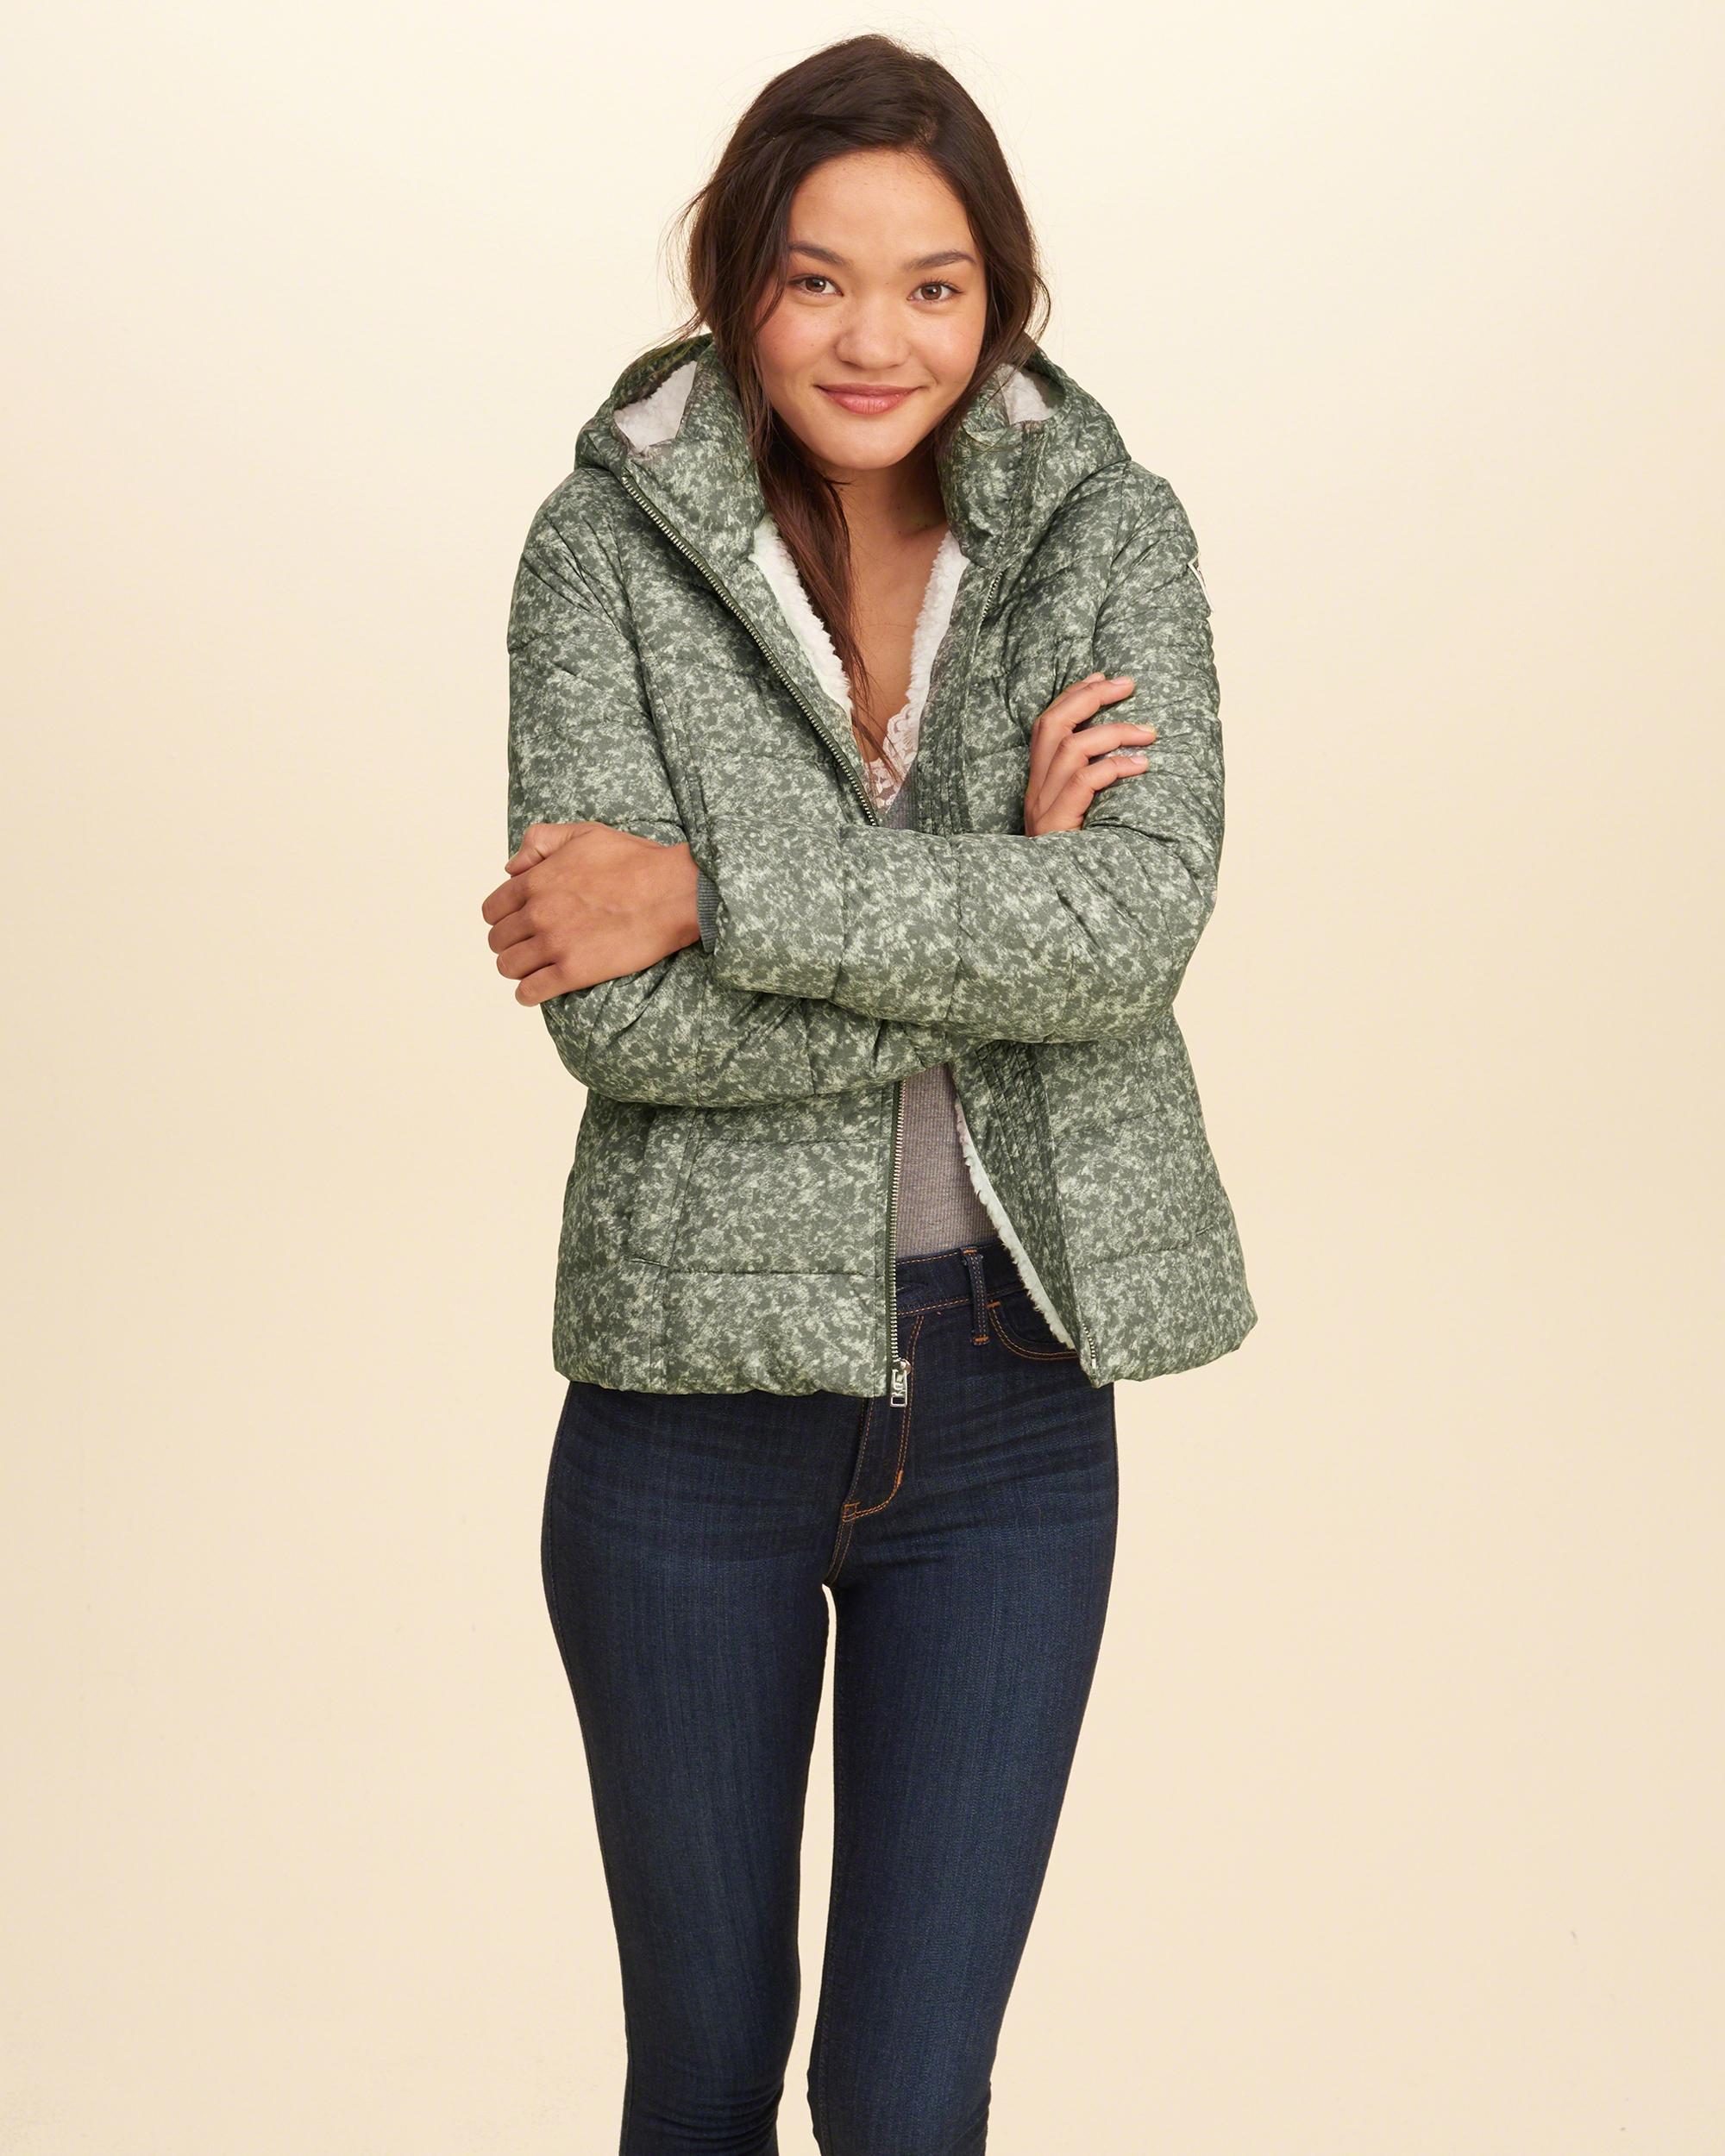 Lyst - Hollister Sherpa Lined Puffer Jacket